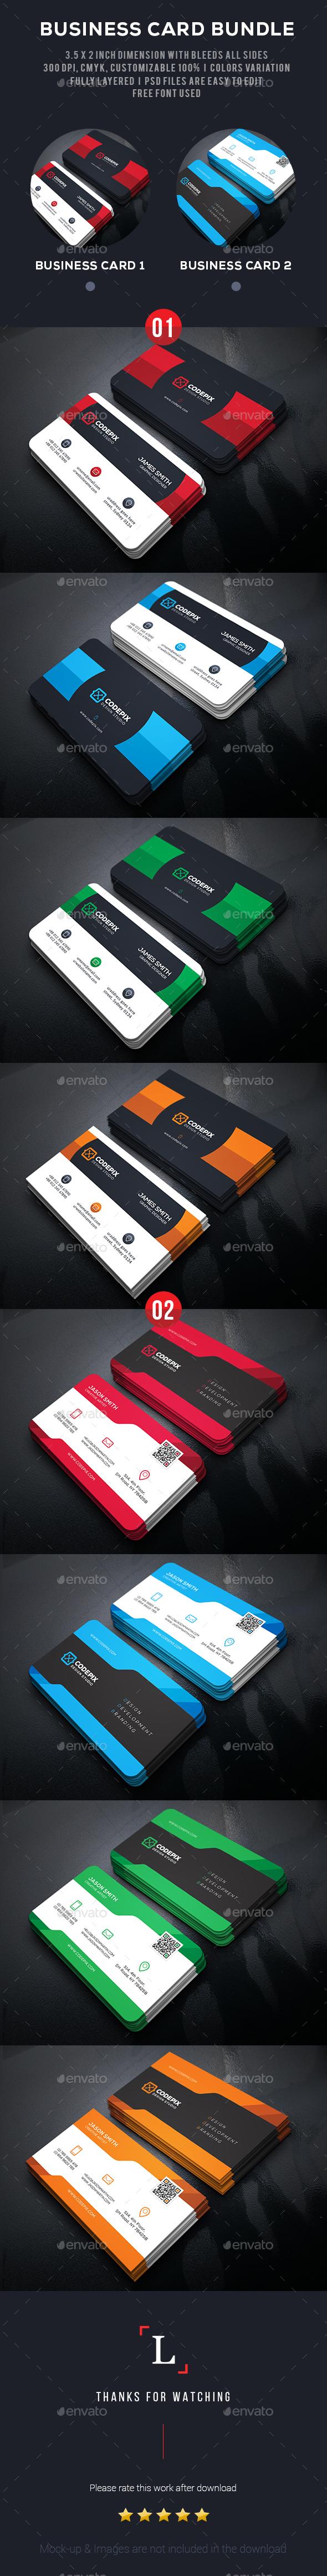 Shape Business Card Bundle - Business Cards Print Templates